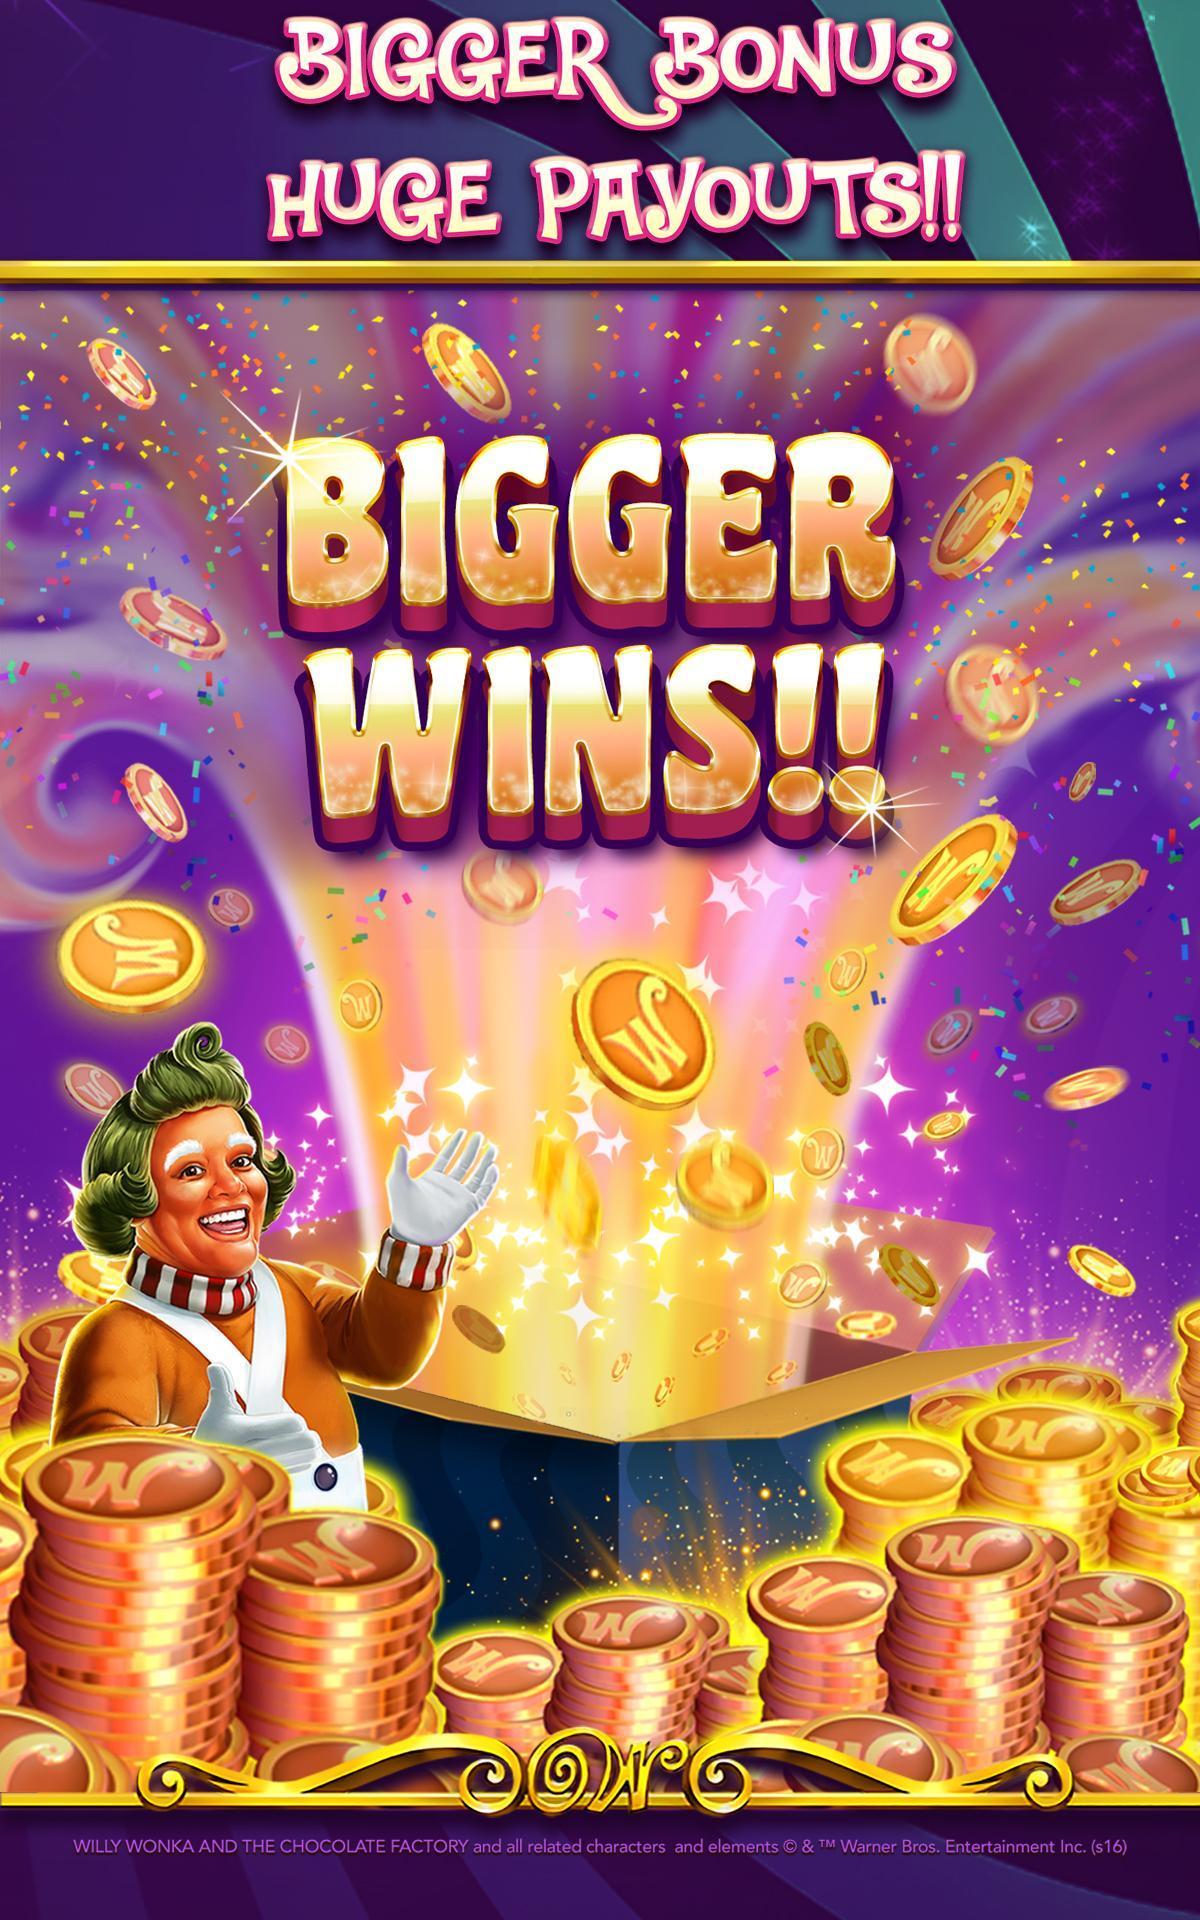 Galaxy 888 casino